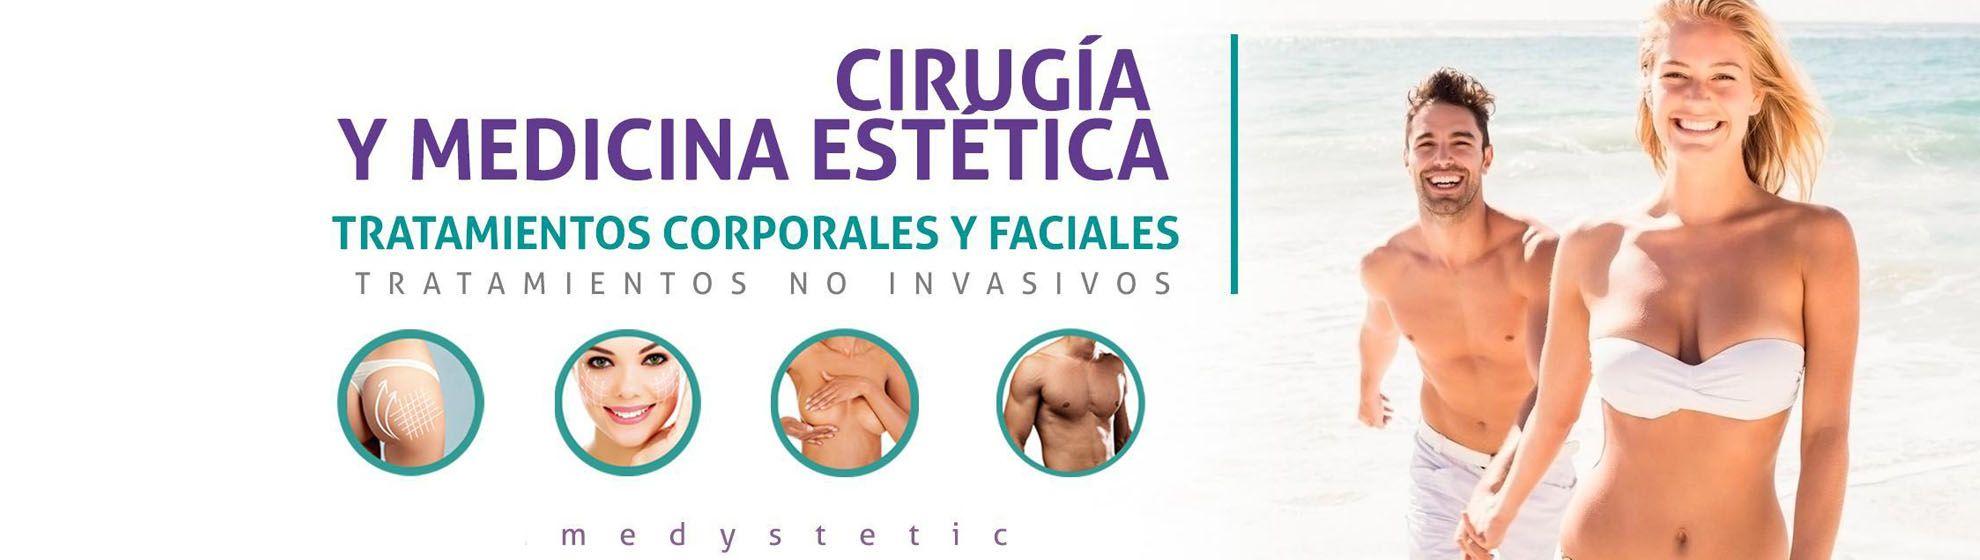 Clínica Medystetic